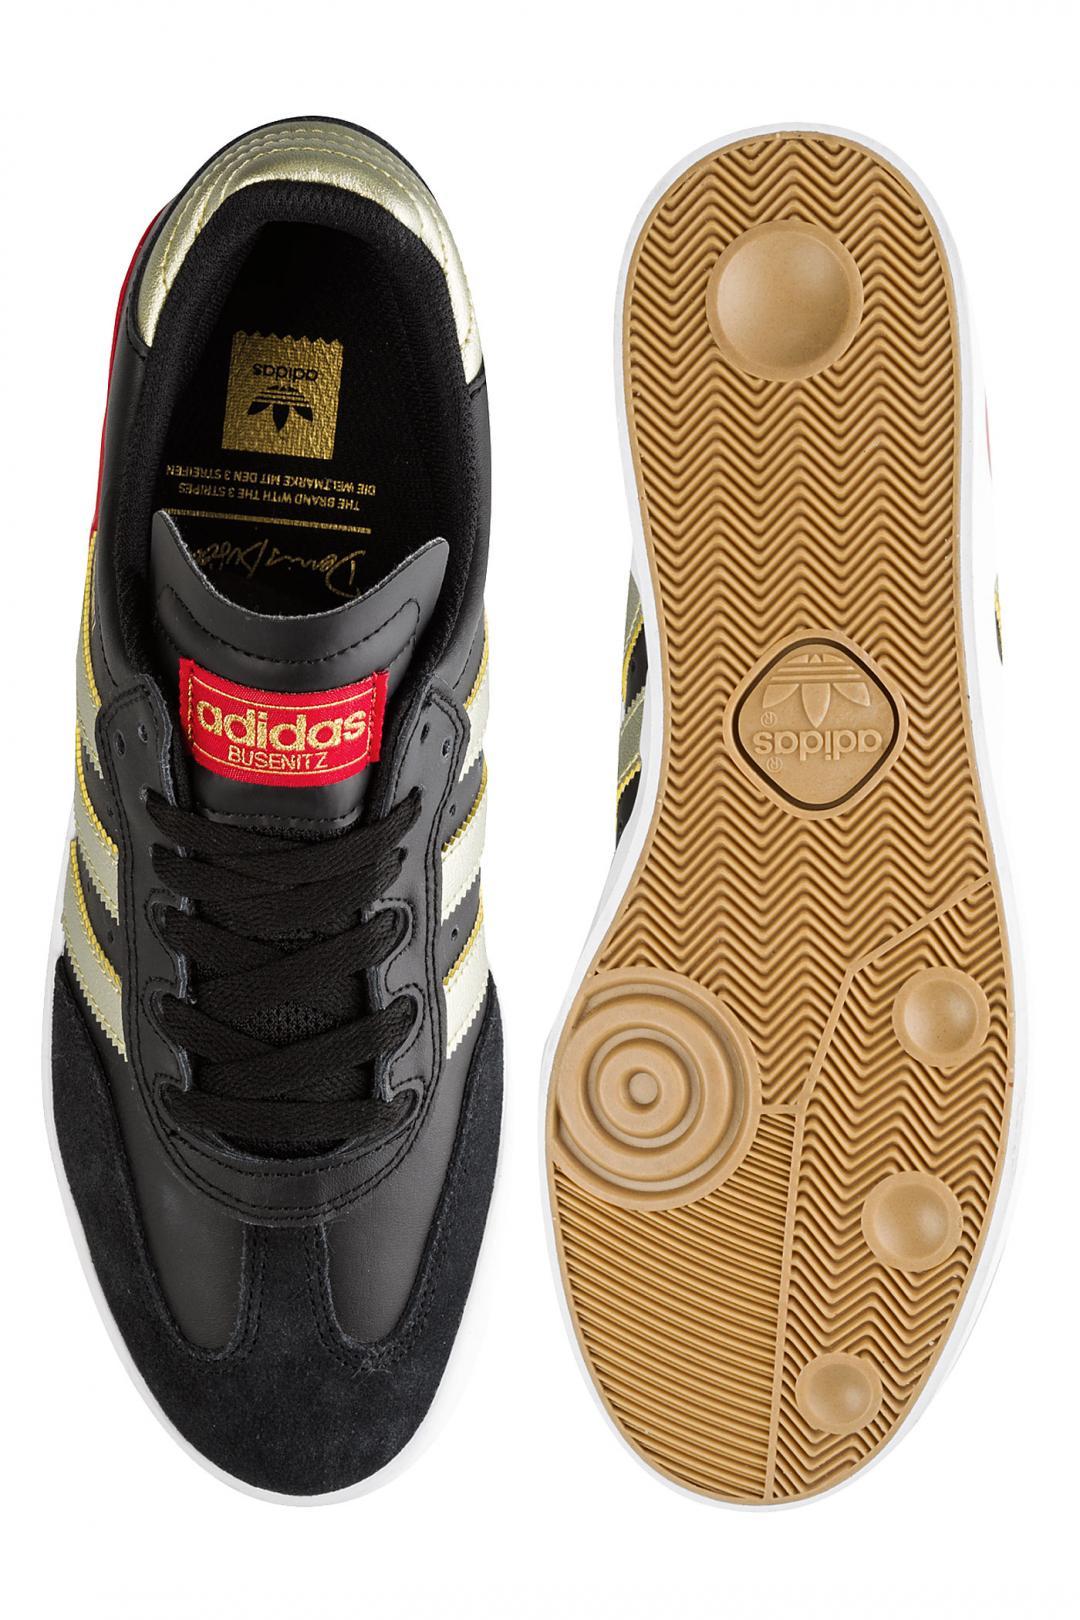 Uomo adidas Skateboarding Busenitz Vulc RX core black gold scarlet   Scarpe da skate